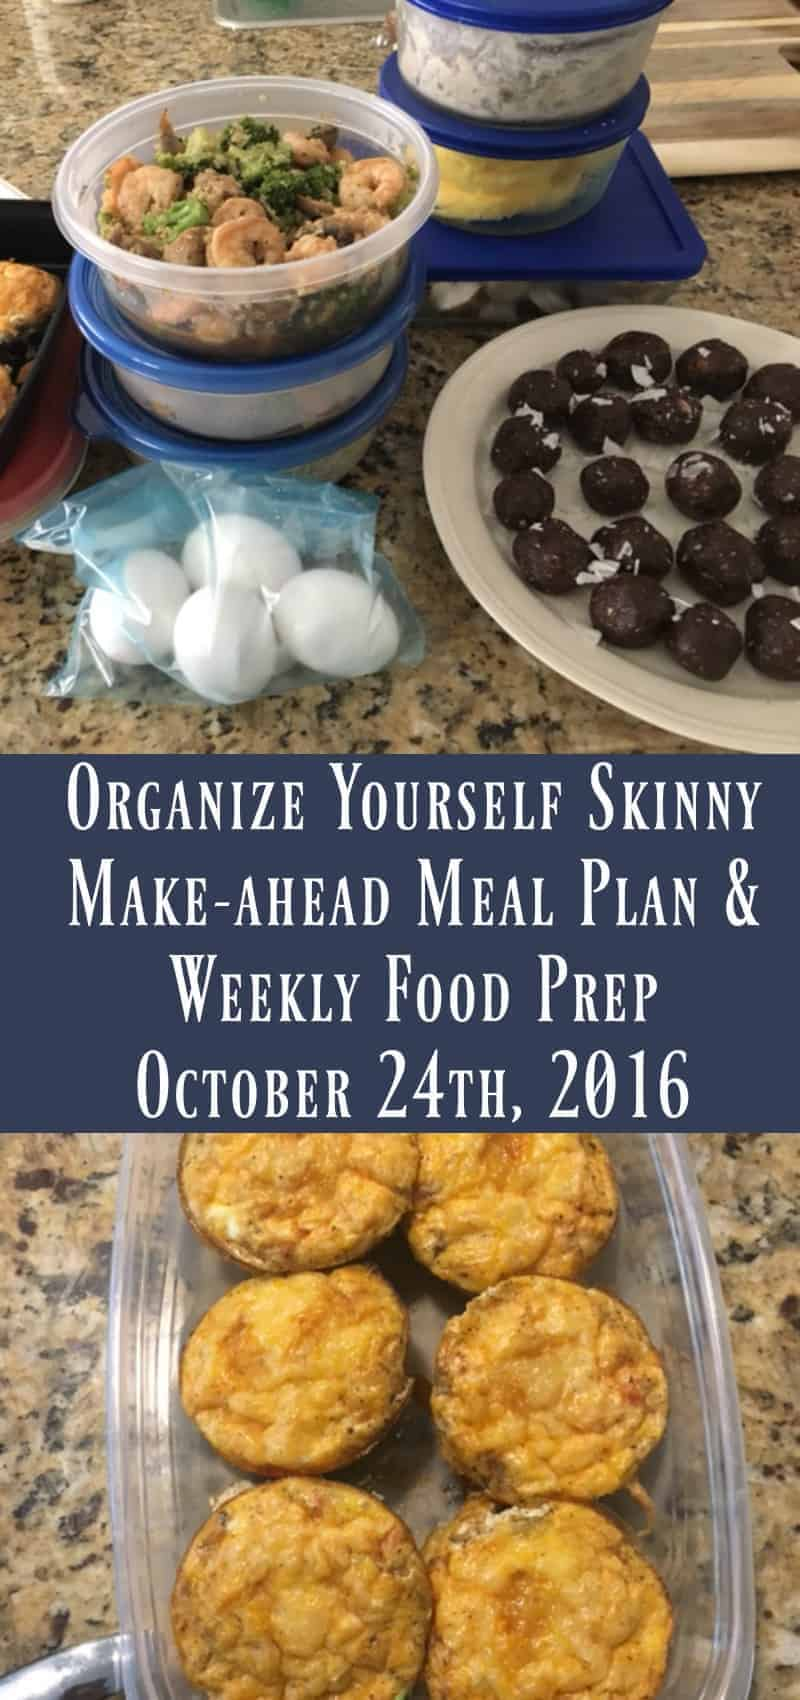 Make-ahead Meal Plan and Weekly Food Prep {October 16th, 2016}